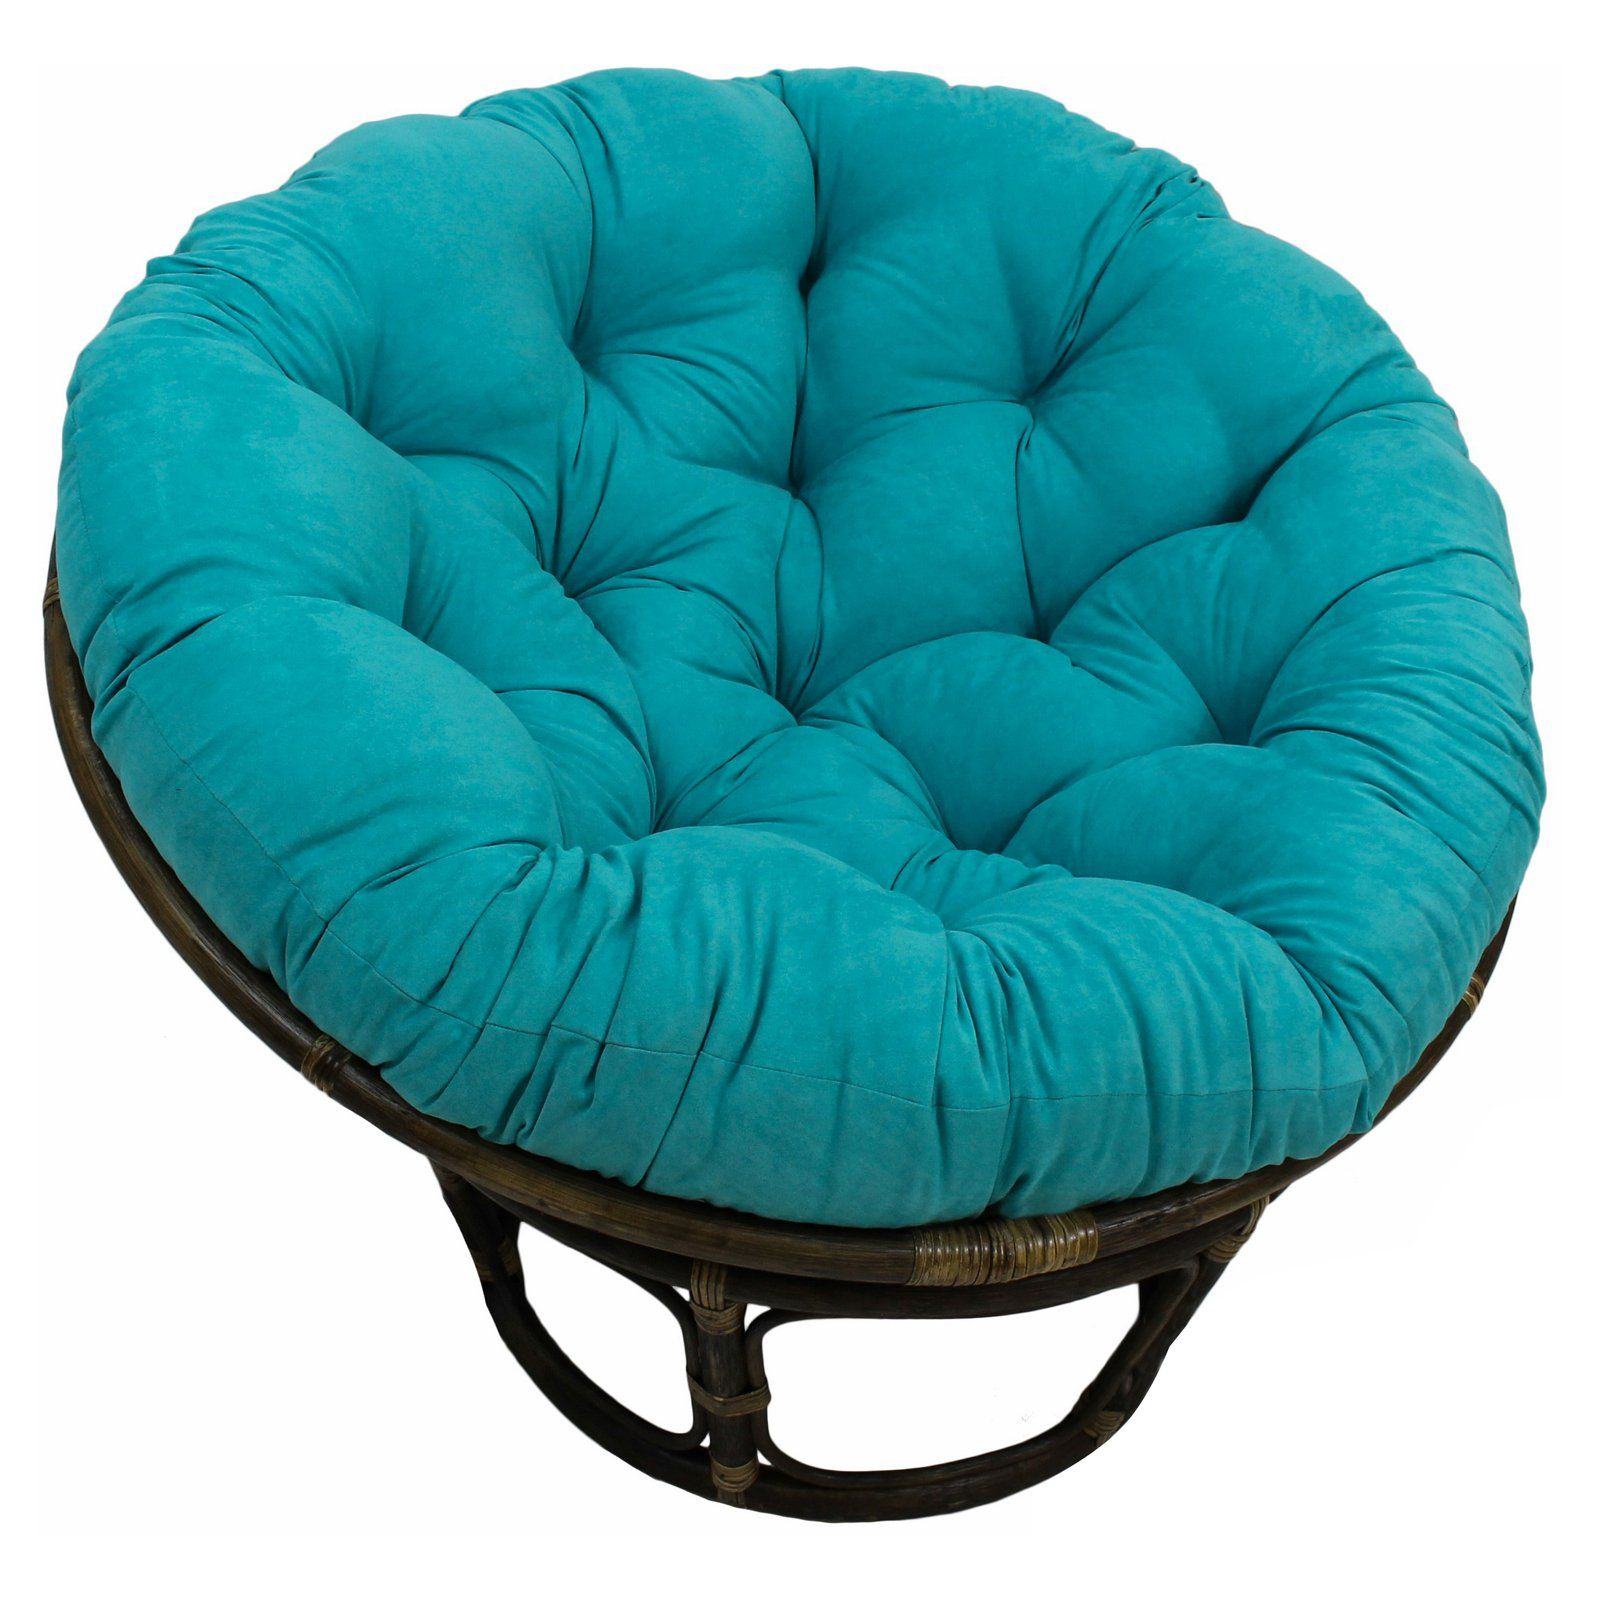 Blazing Needles Microsuede Papasan Cushion Saddle Brown Intended For Campton Papasan Chairs (View 11 of 15)